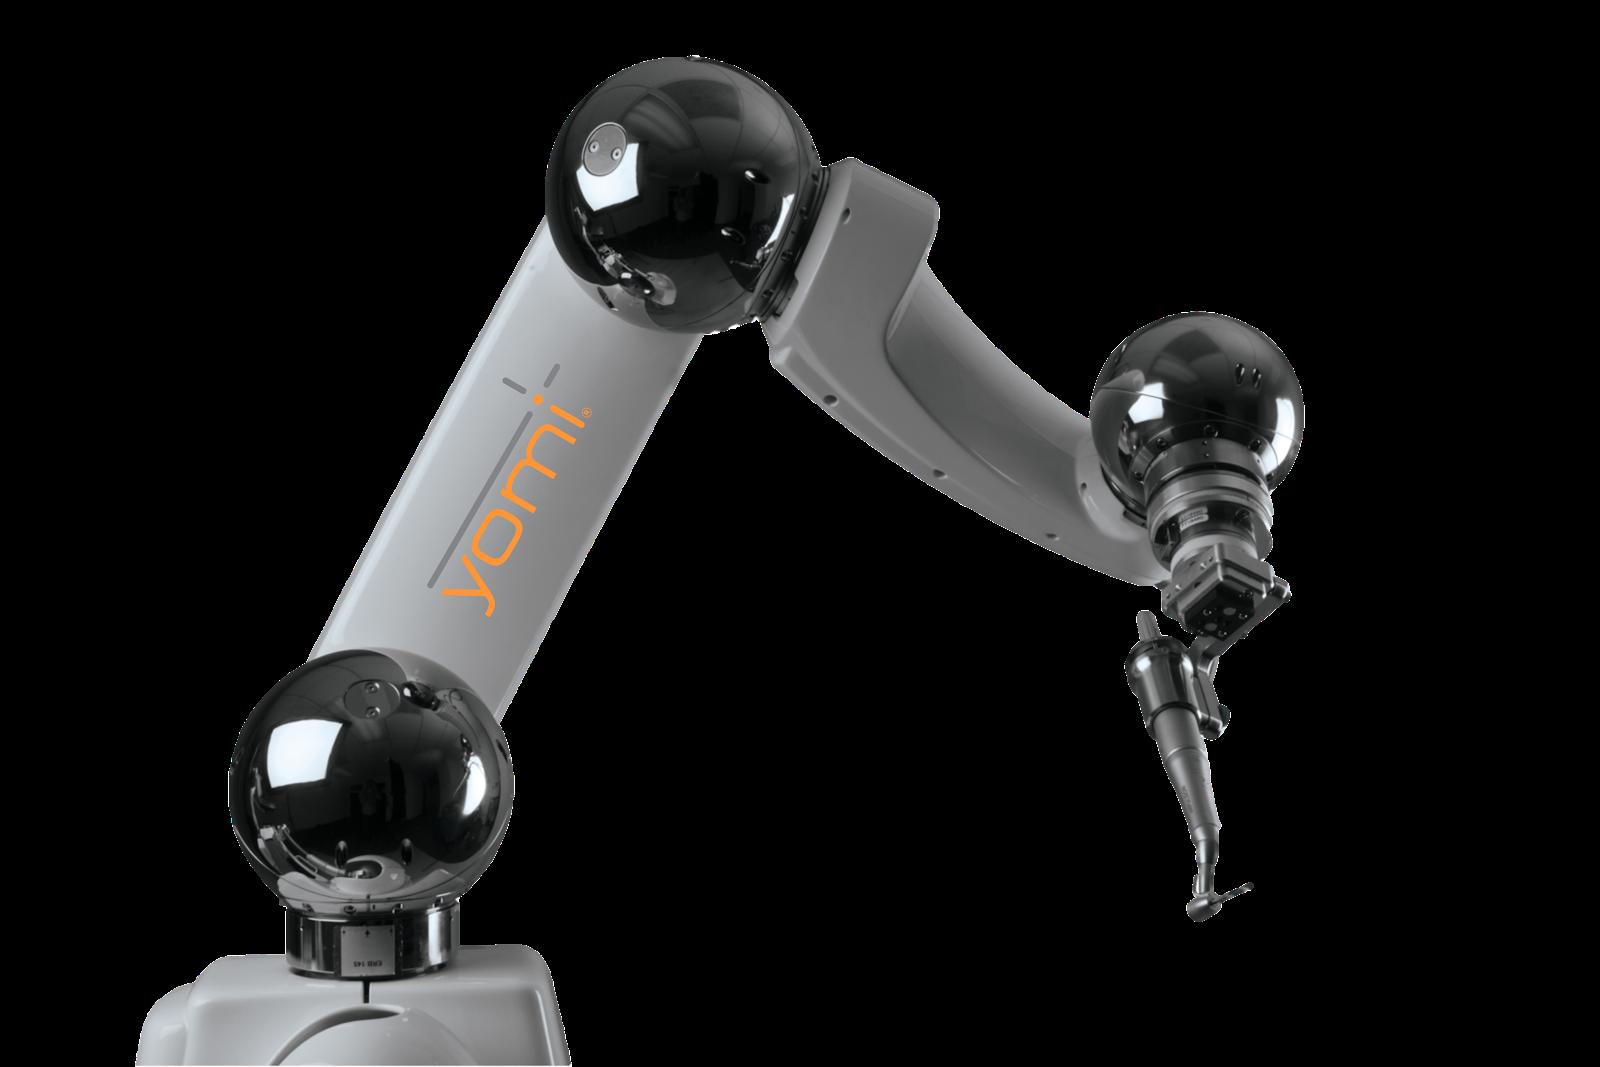 Neocis' robot, Yomi